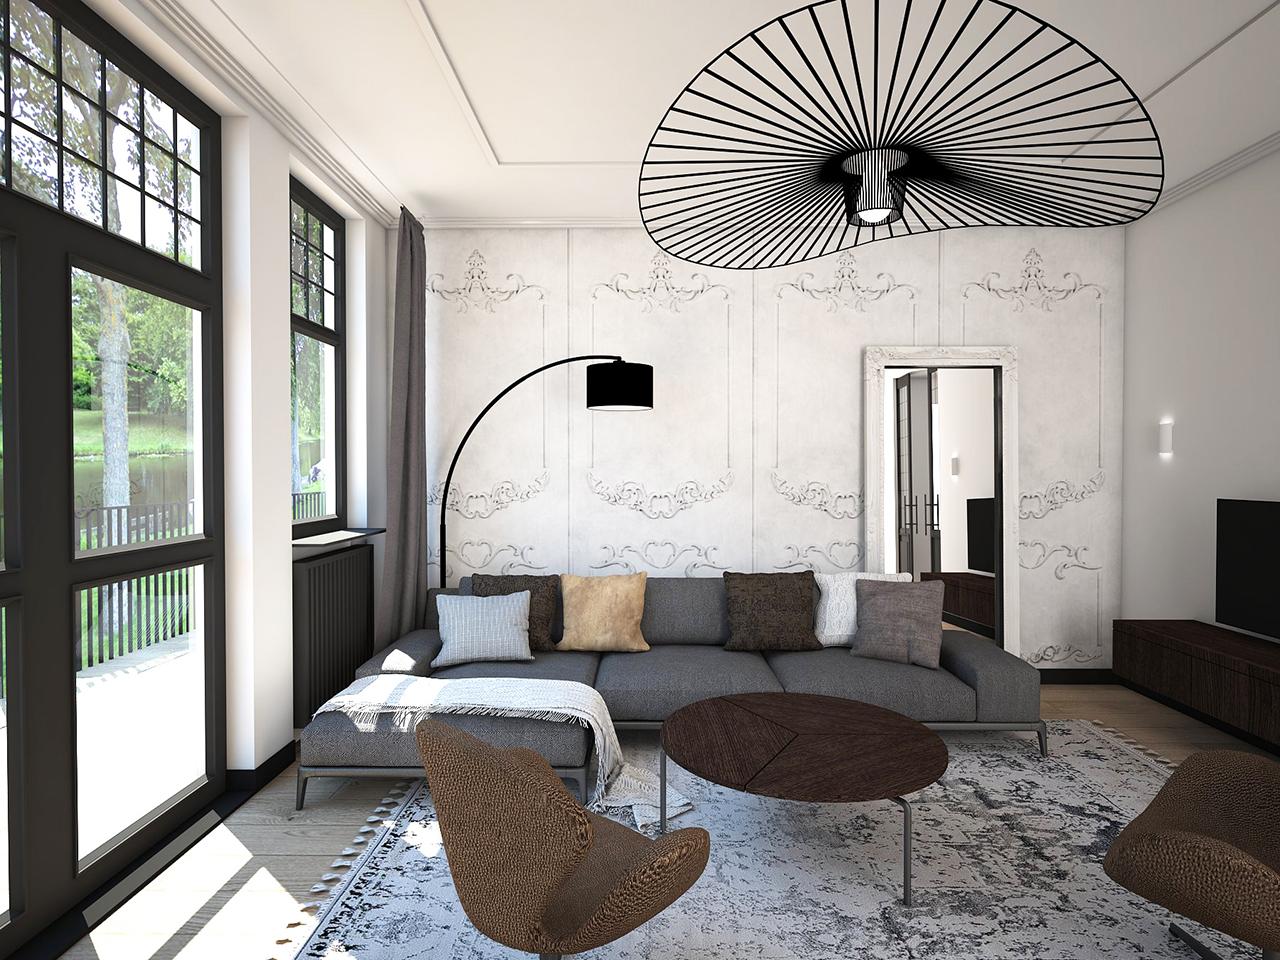 Modern Klassieke Inrichting. I Love The Serenity And Simplicity In ...